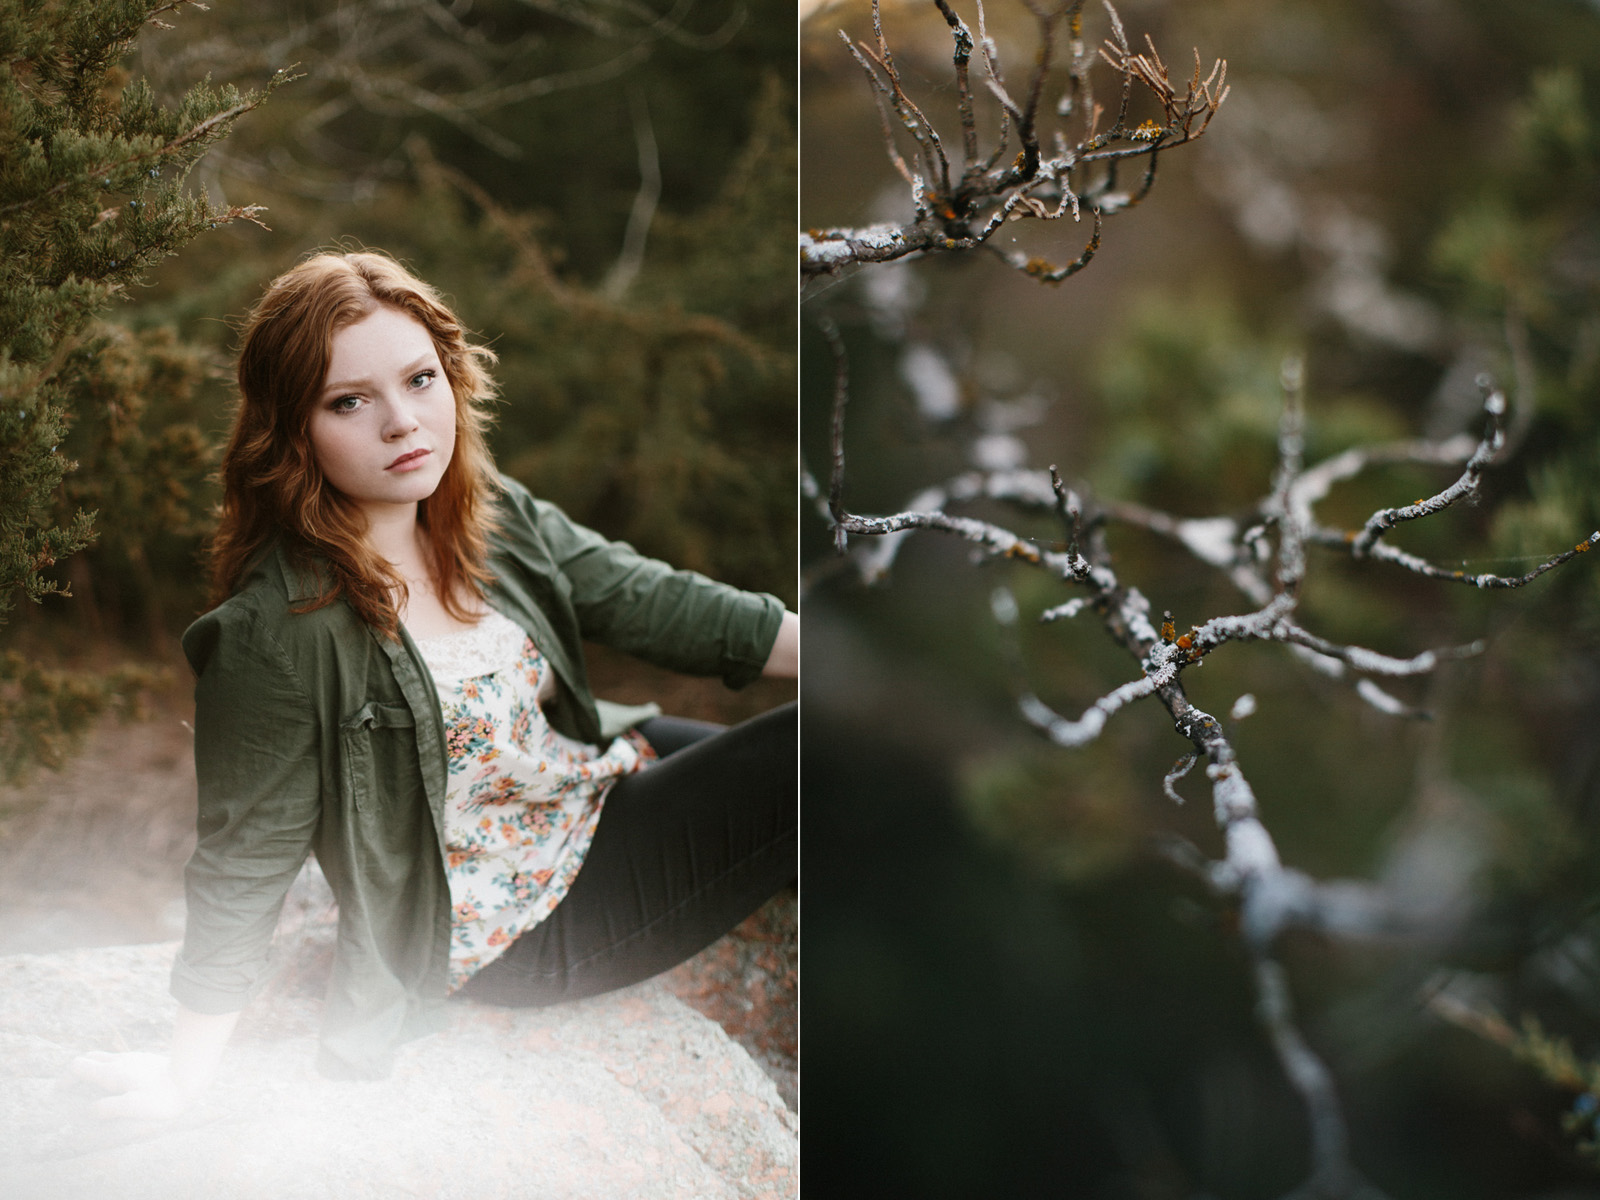 Sioux_Falls_Portrait_Photography_02.jpg